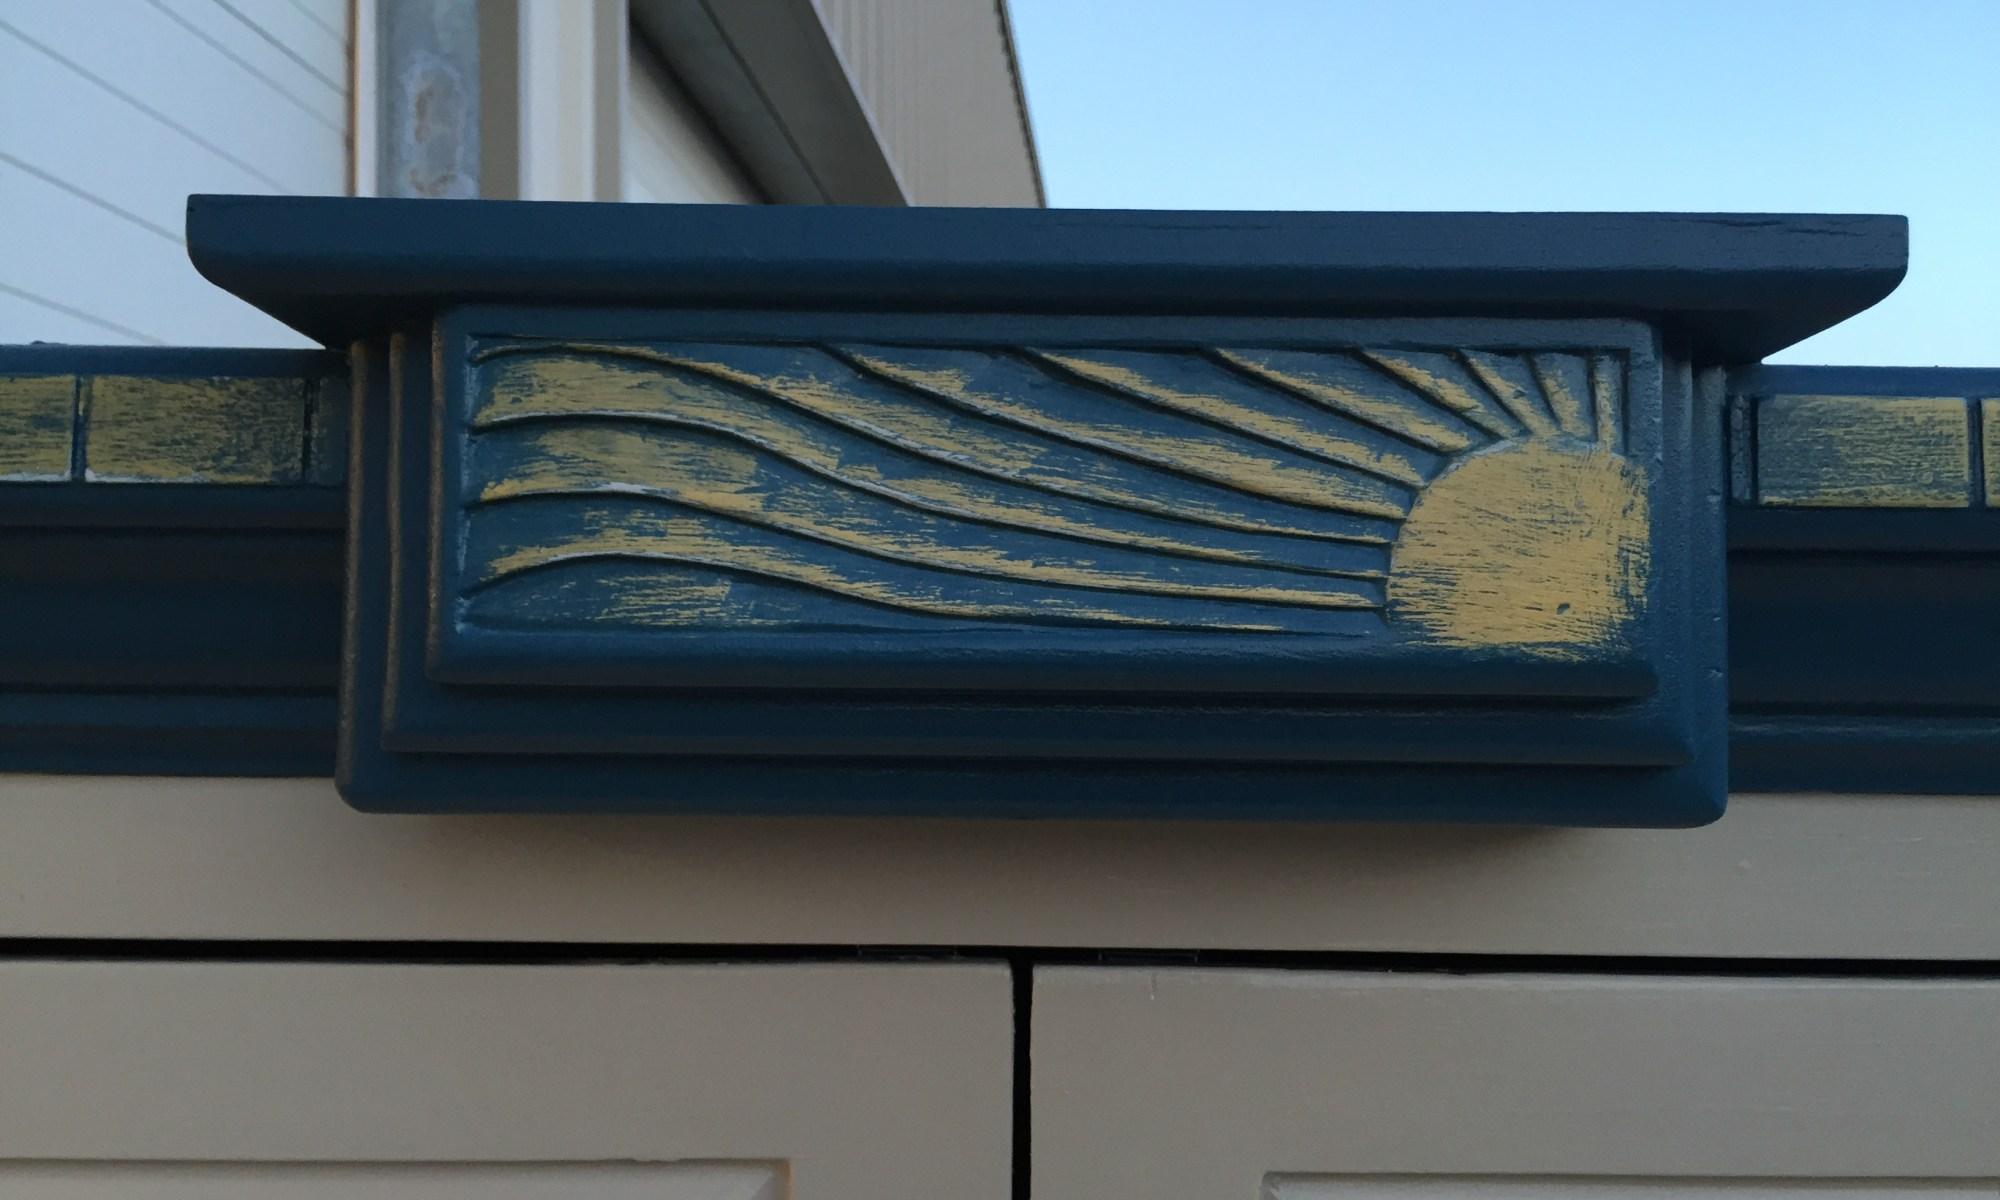 sun armoire - sun carving